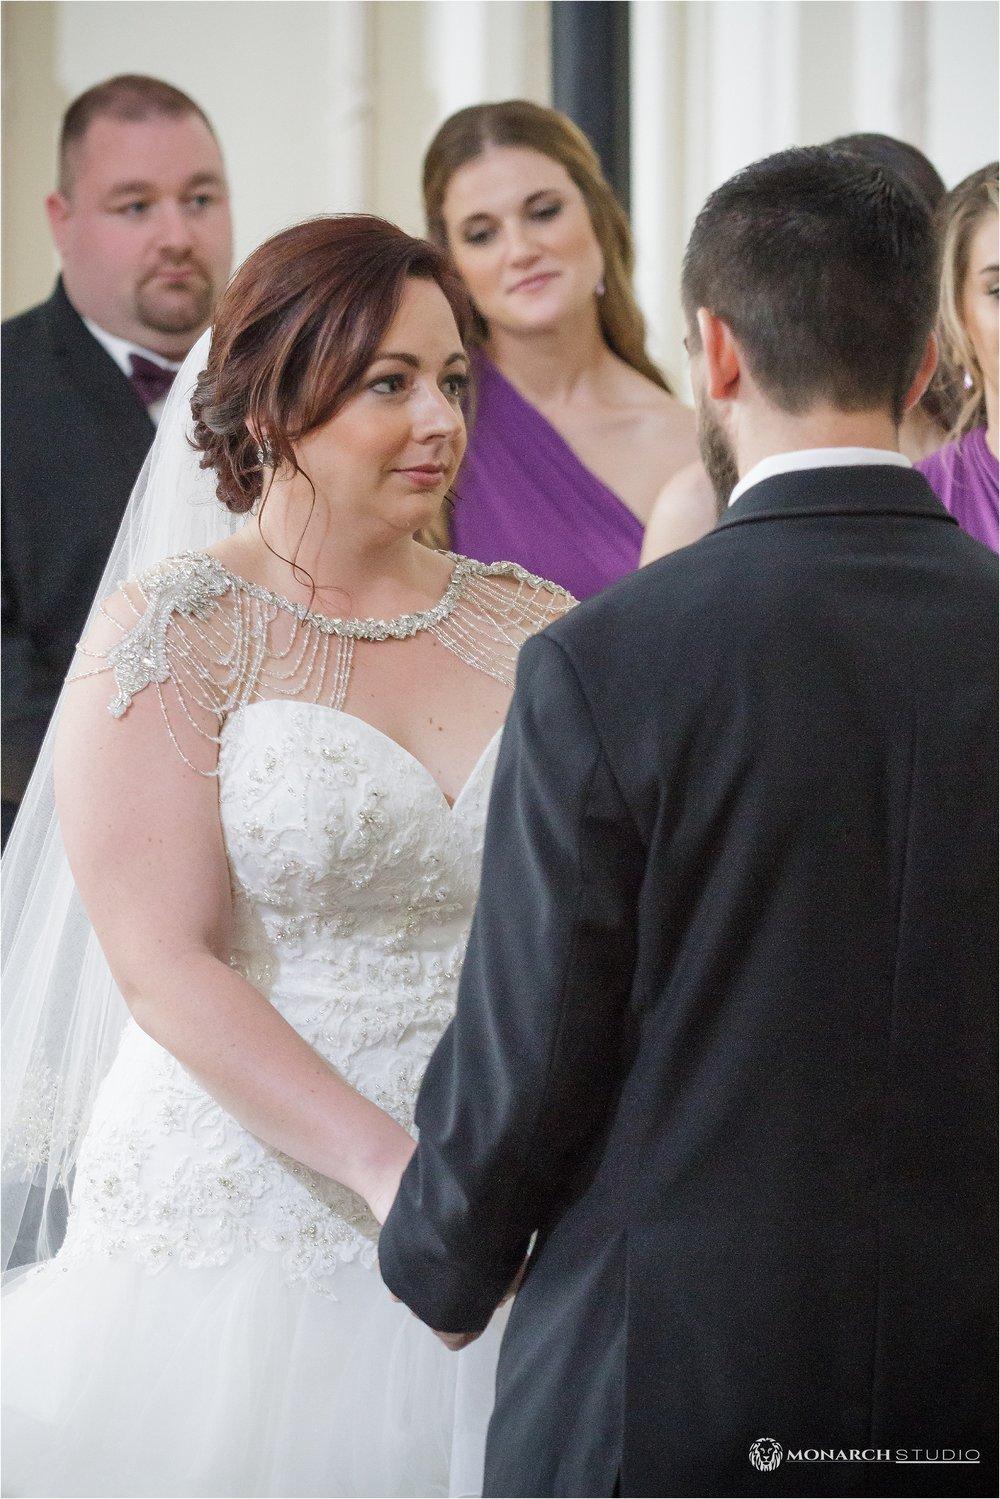 st-augustine-wedding-photographer-treasury-on-the-plaza-027.jpg